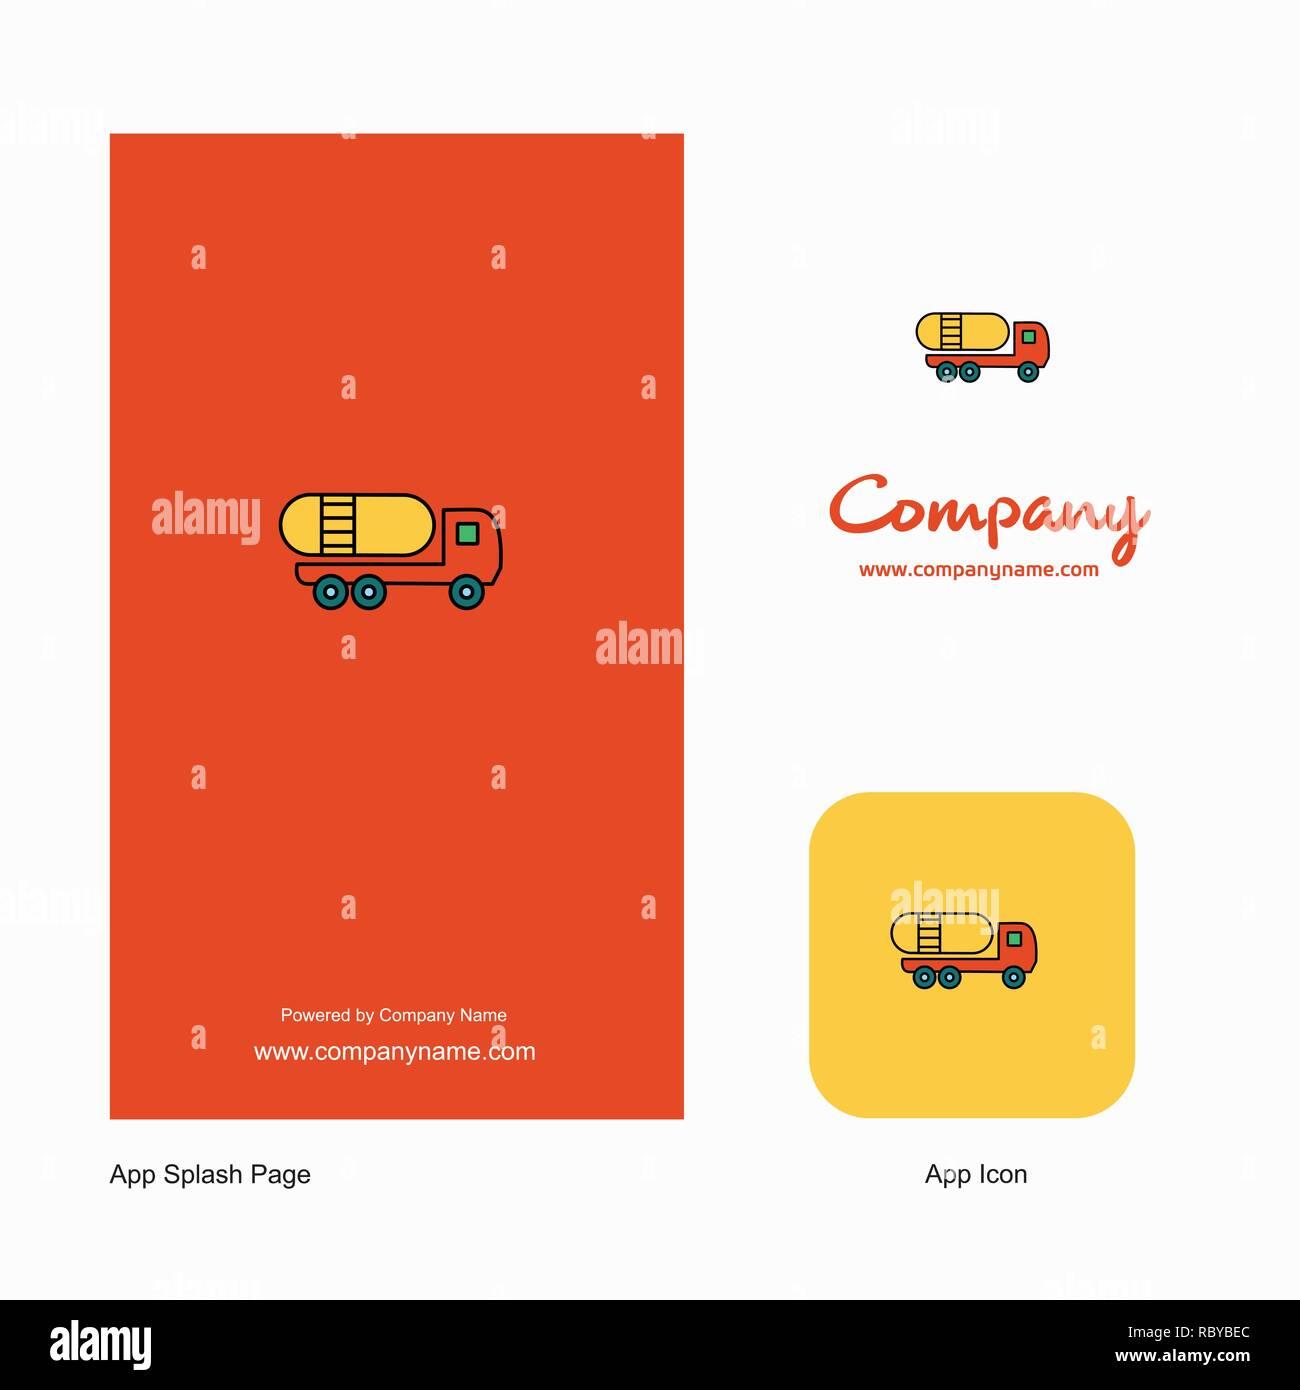 Tanker truck Company Logo App Icon and Splash Page Design